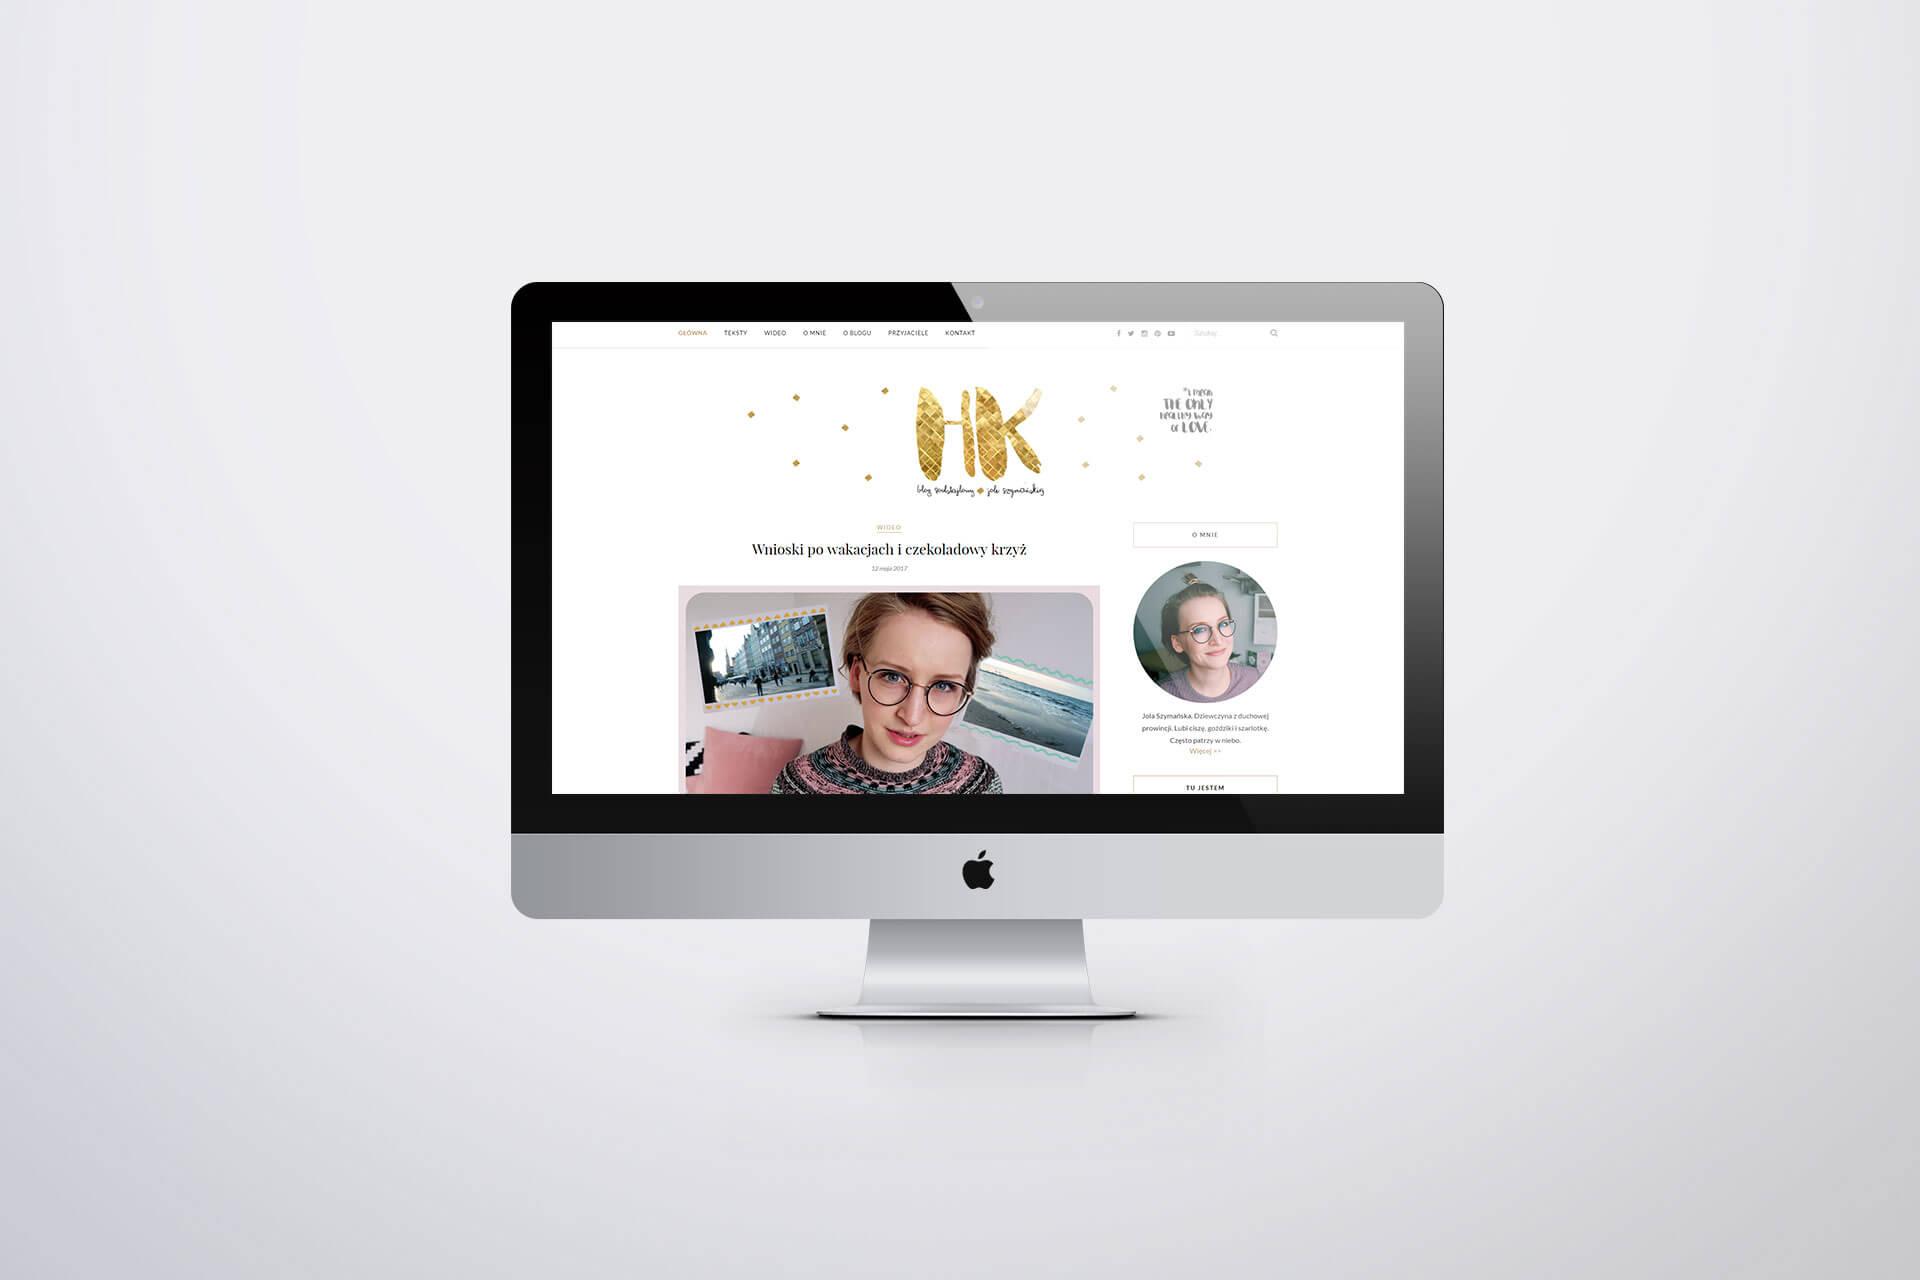 blog-internetowy-hipster-katoliczka